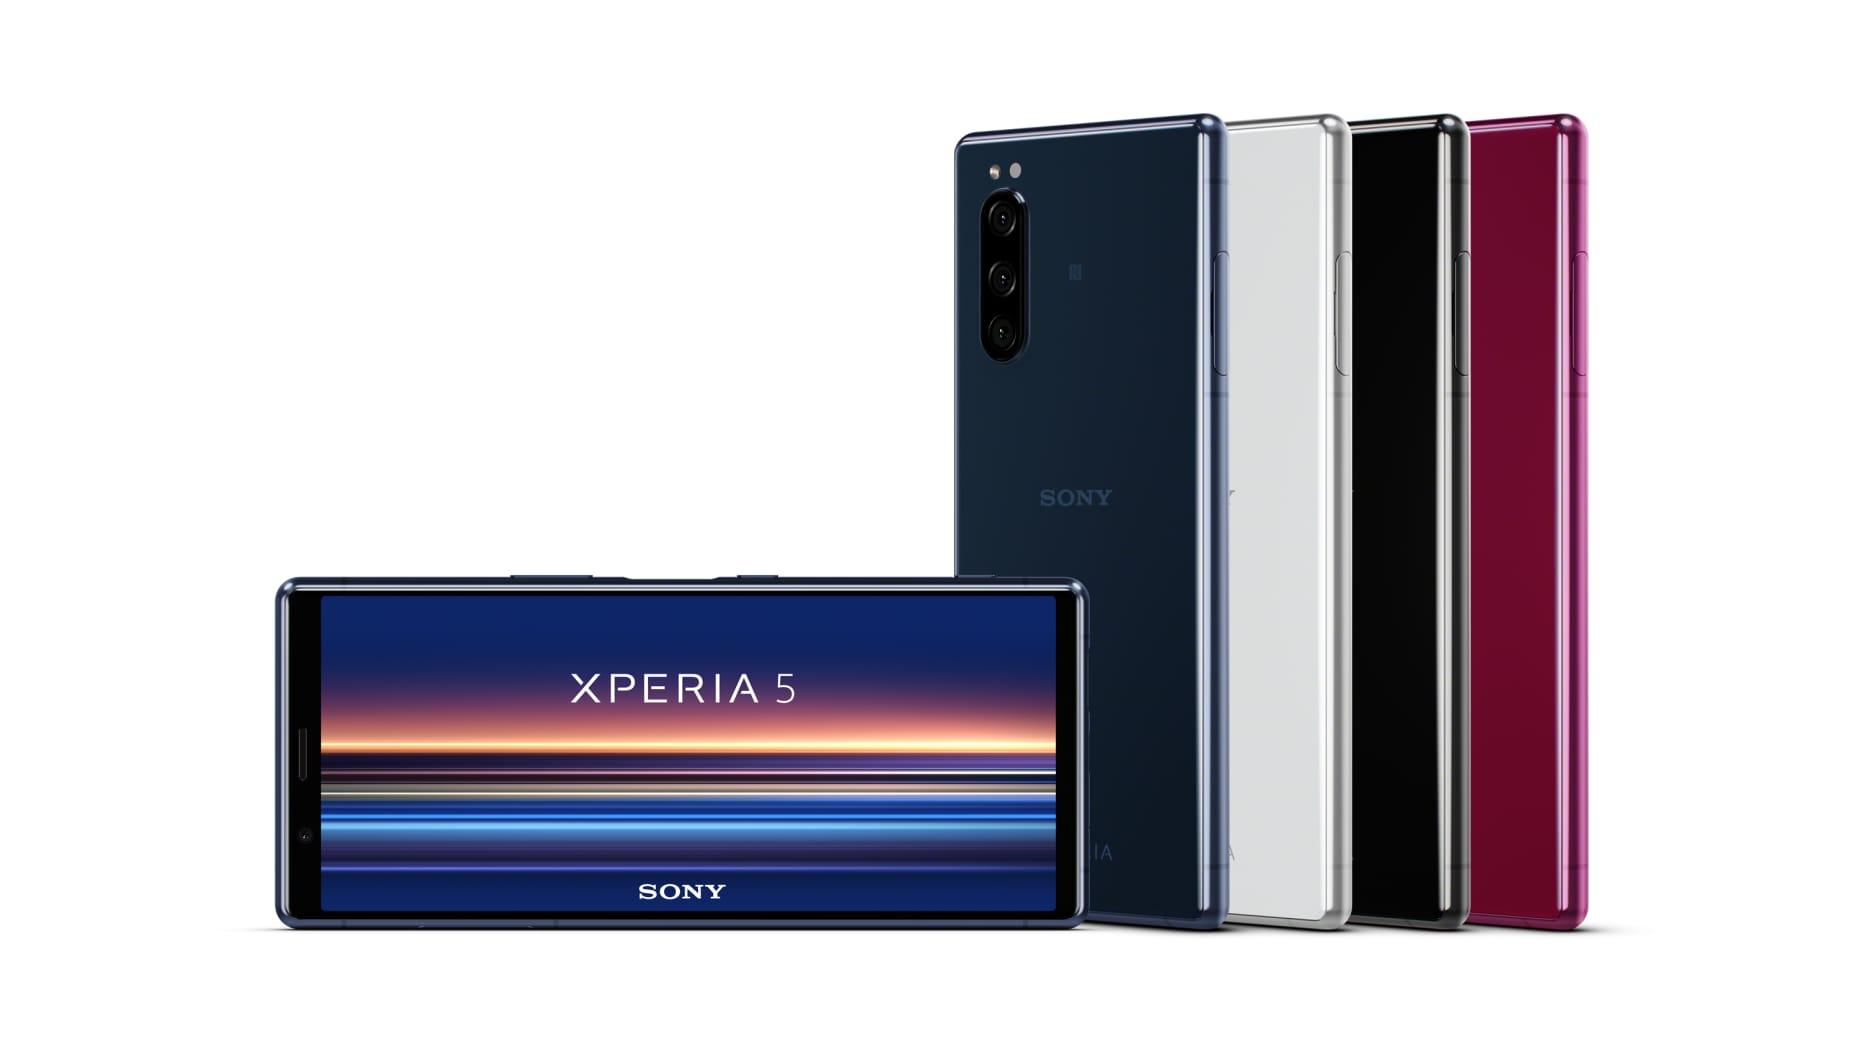 Sony Xperia 5 Smartphone